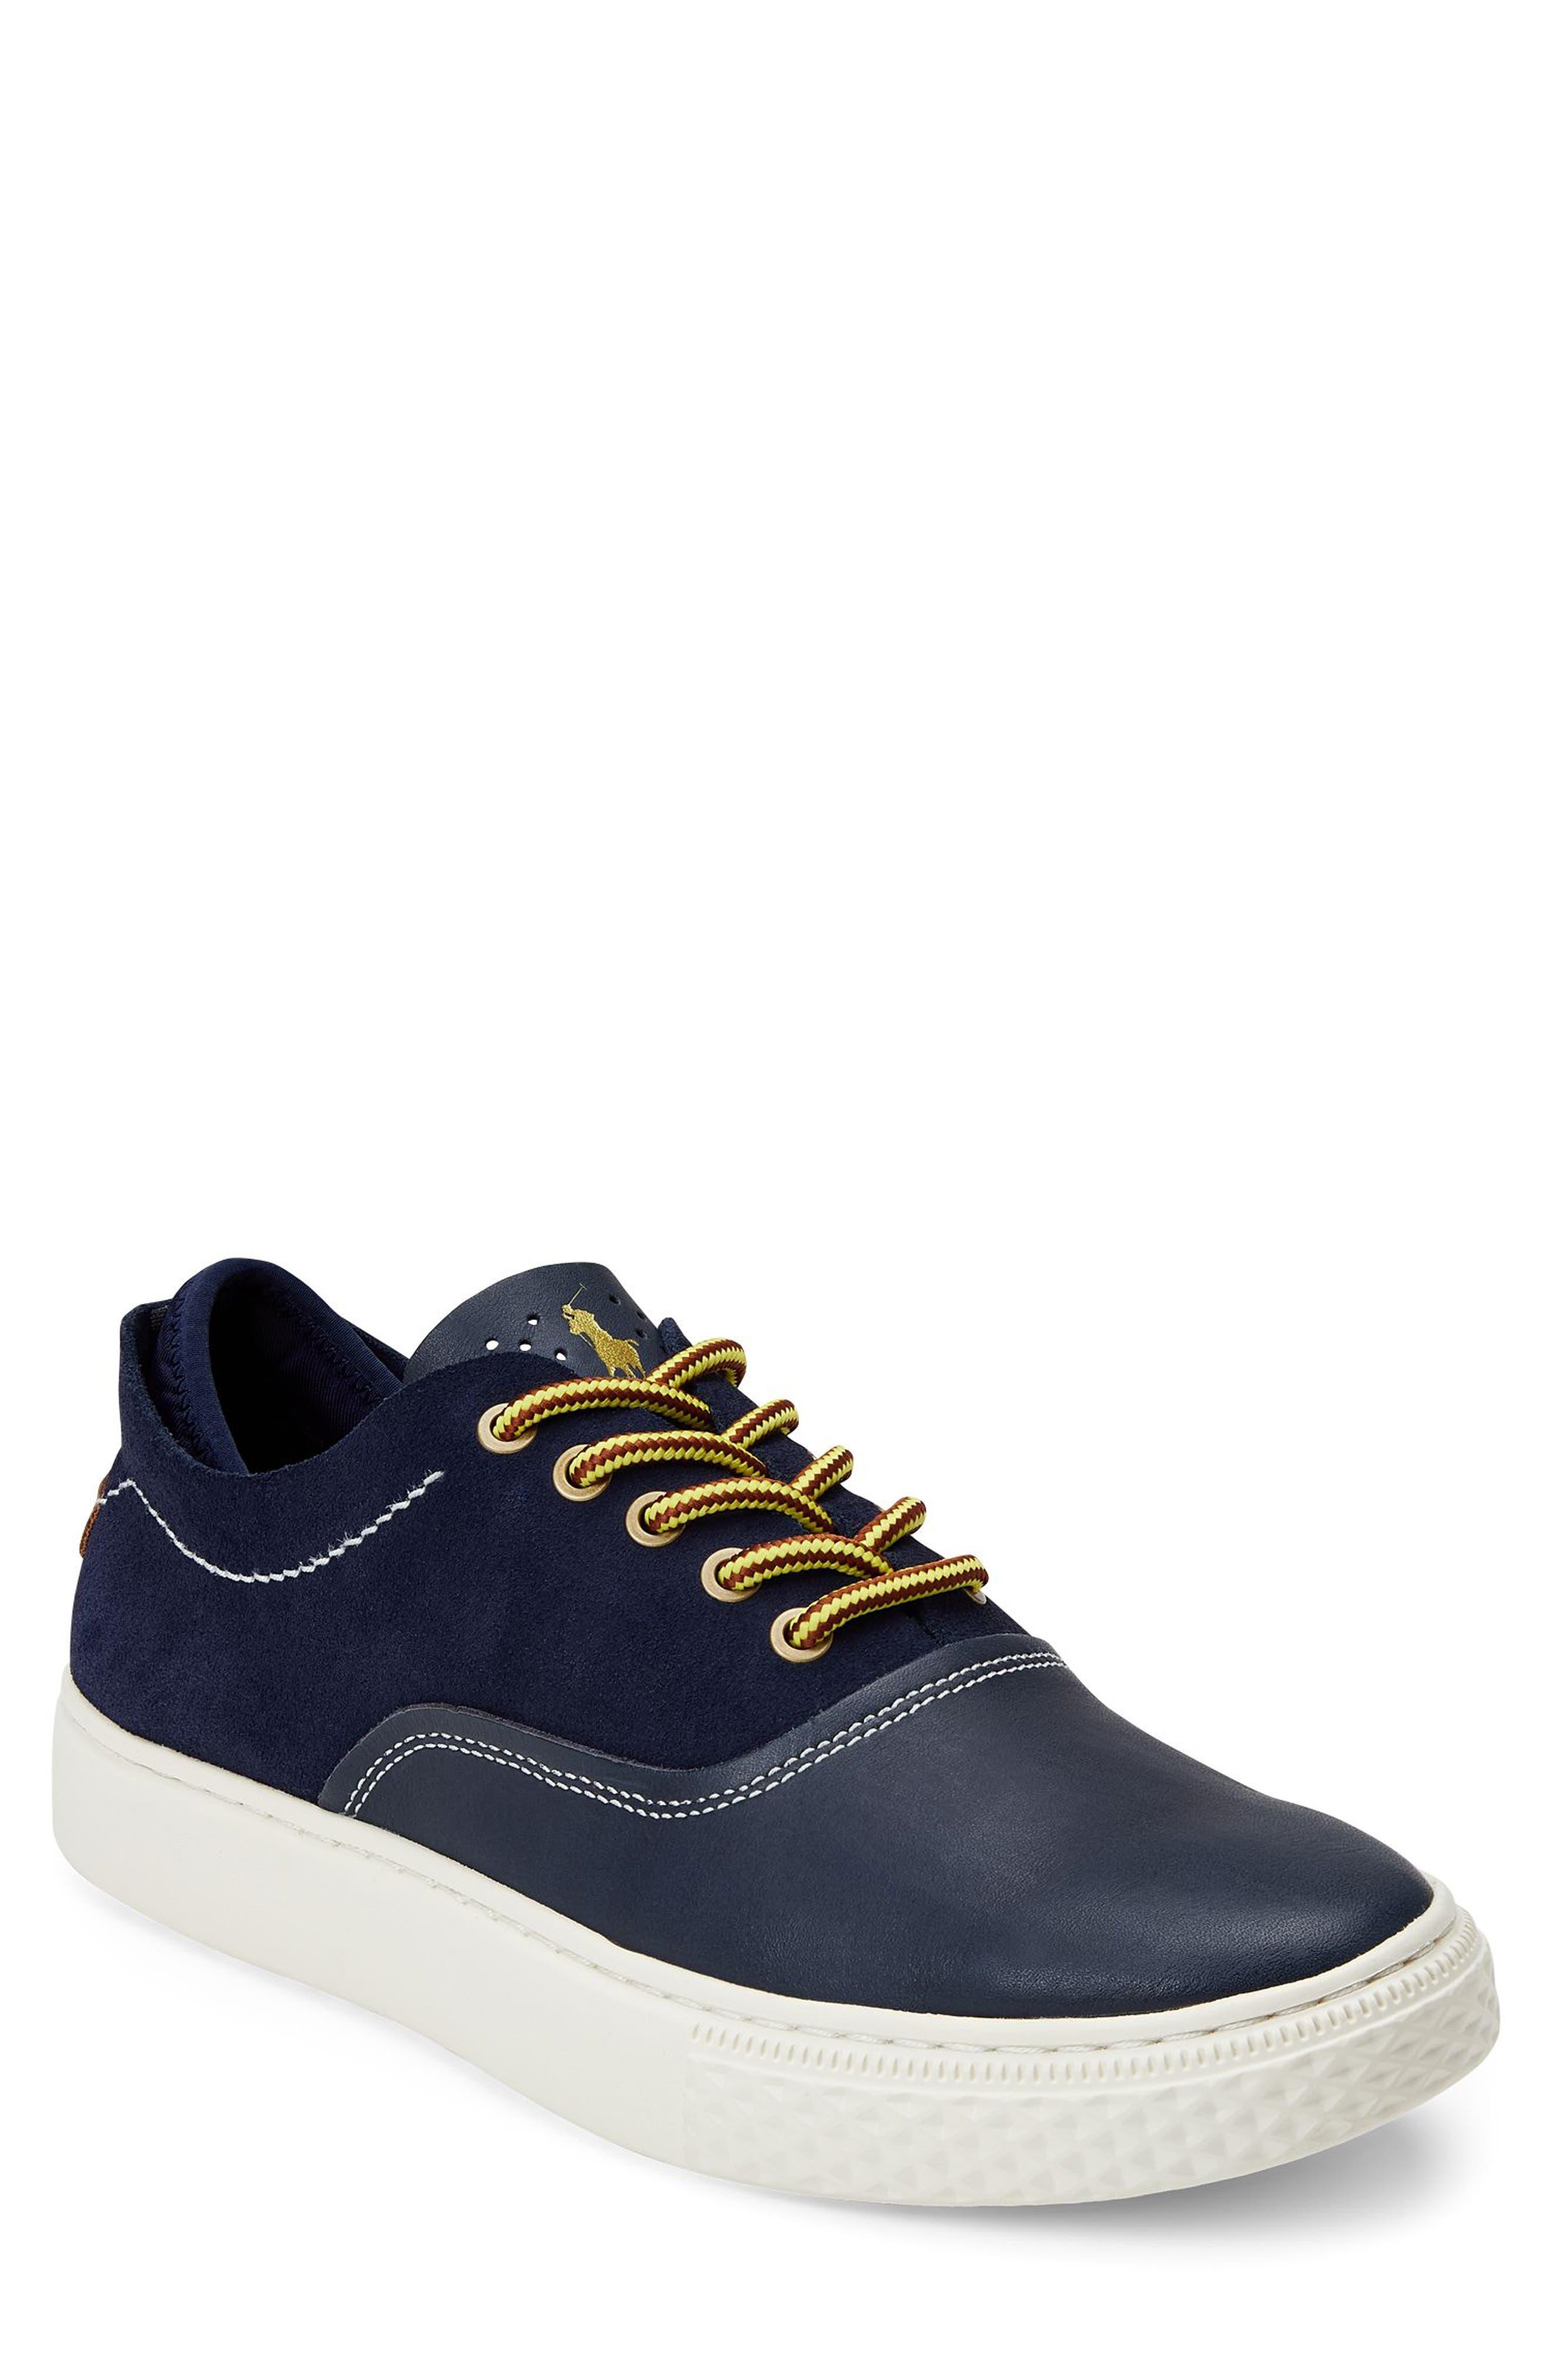 POLO RALPH LAUREN, Thorton 100 Sneaker, Alternate thumbnail 2, color, 410